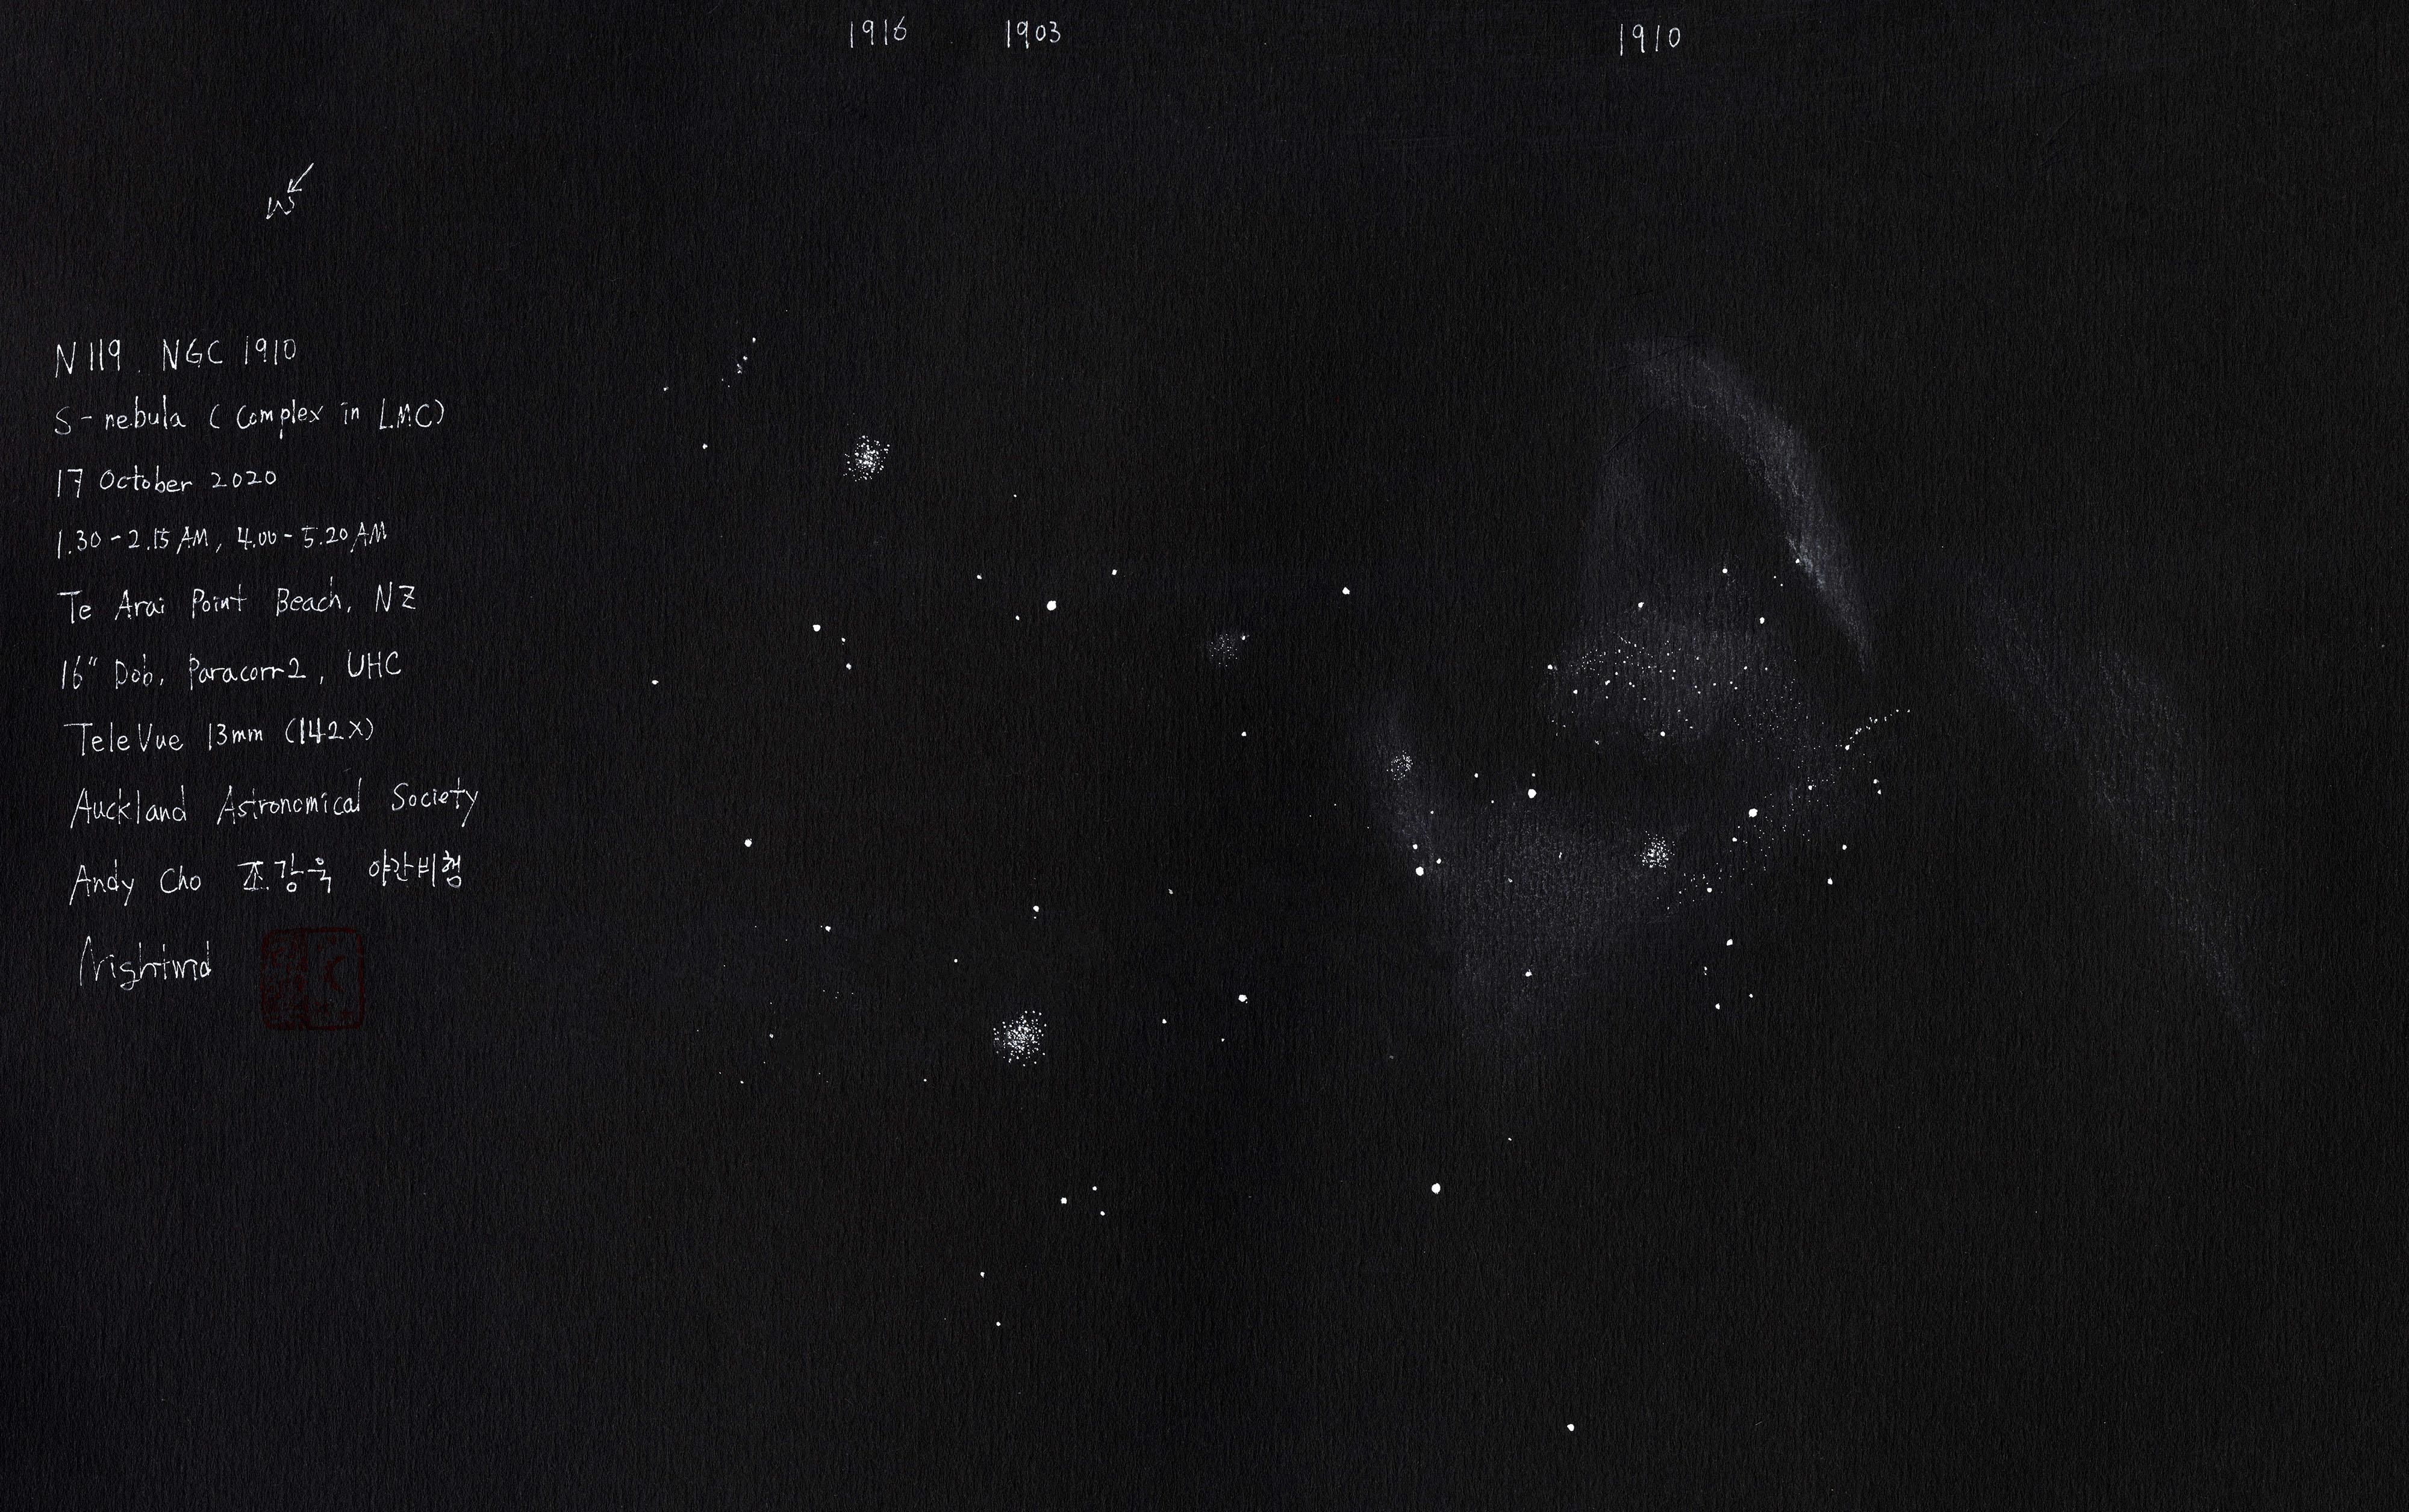 NGC1910_4000_201017.jpg